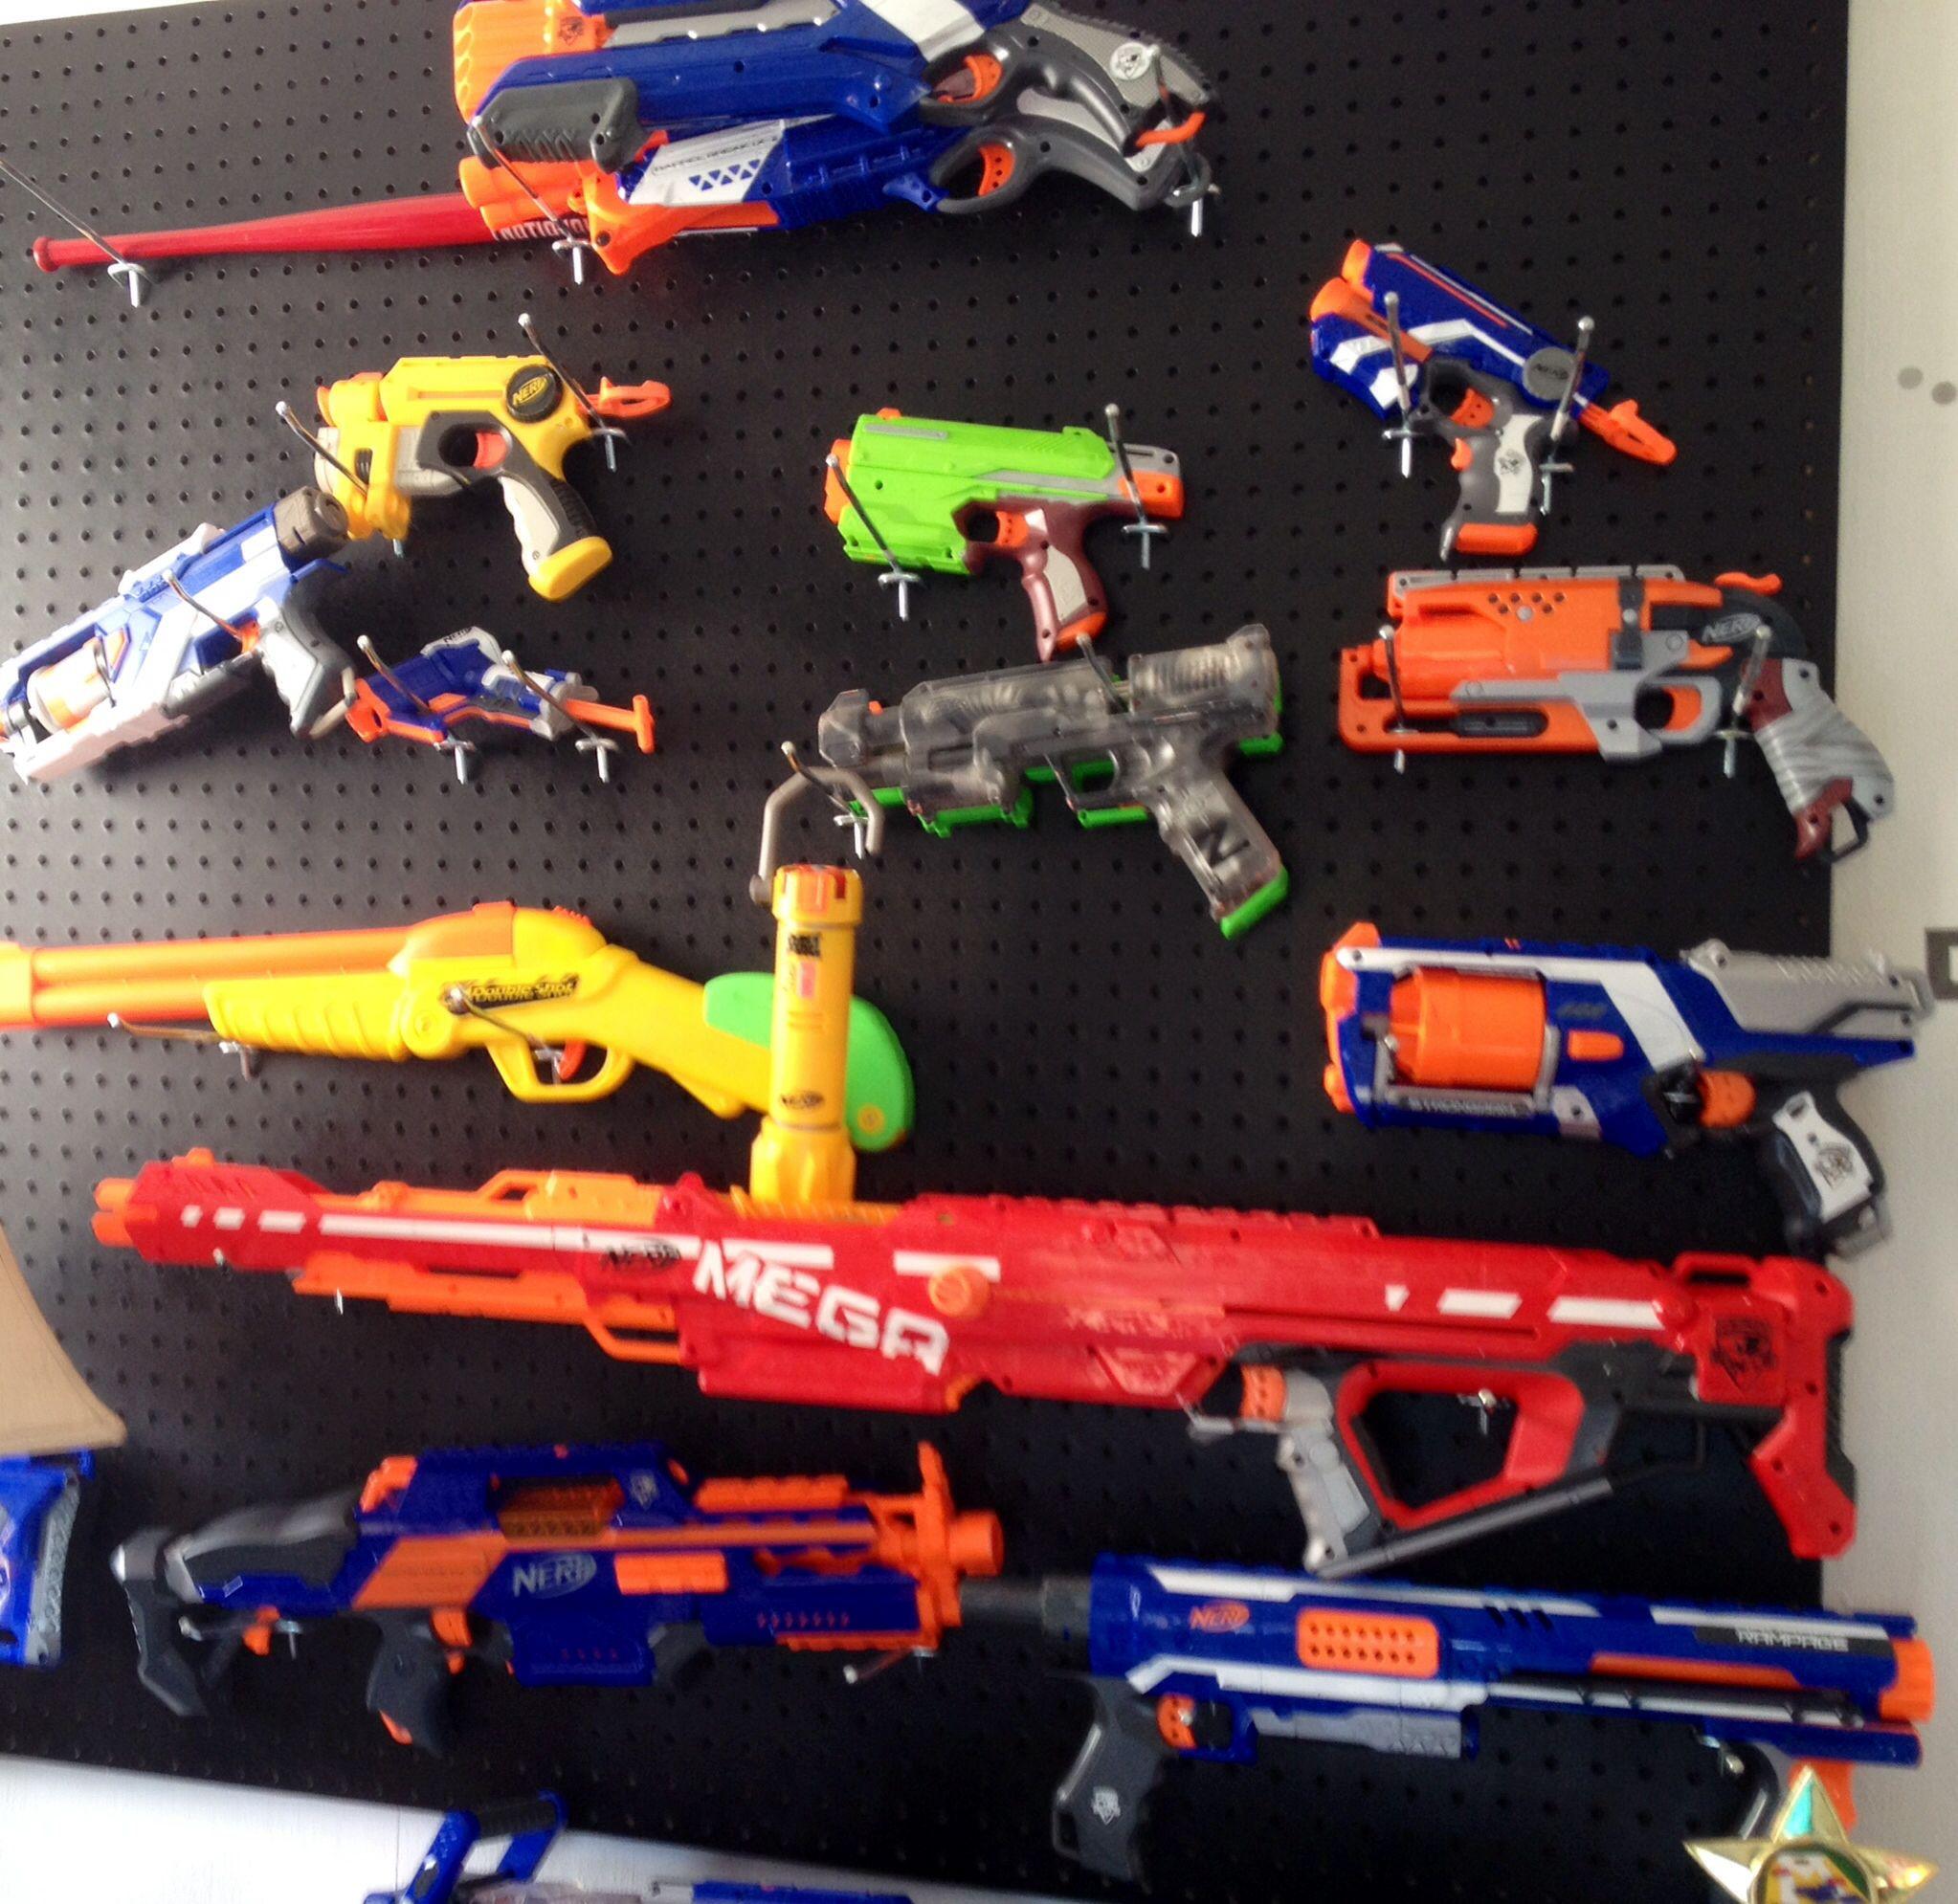 Nerf gun arsenal. Peg board spray painted black. Hang the guns on the pegs